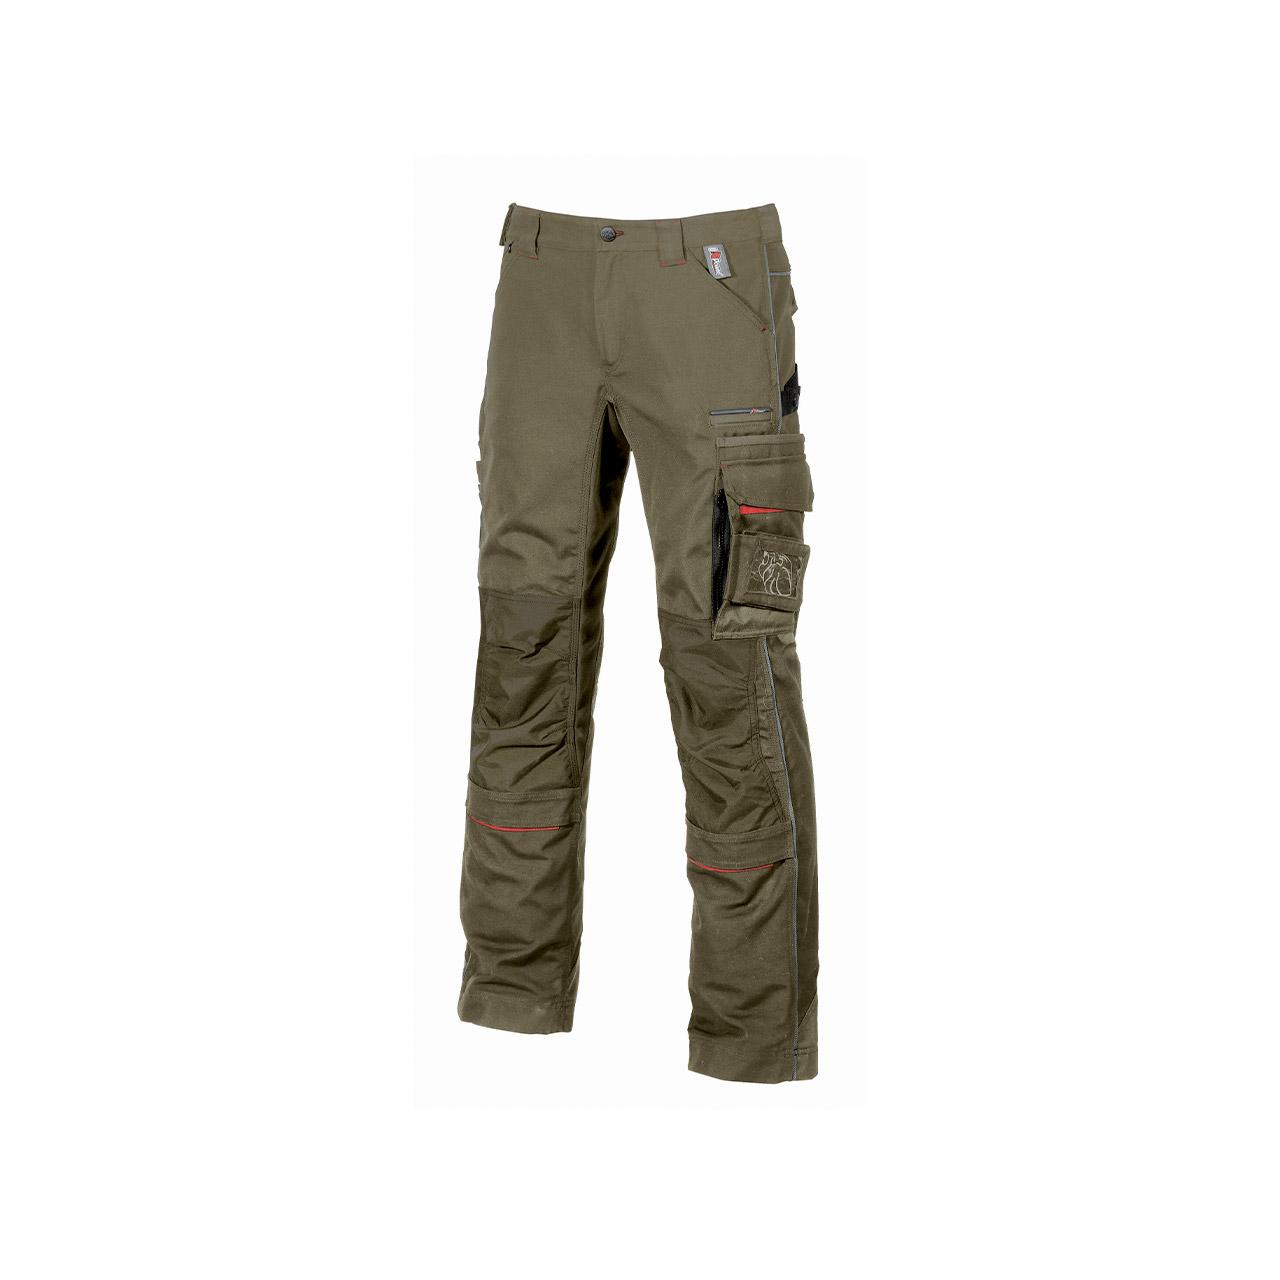 pantalone da lavoro upower modello drift colore desert